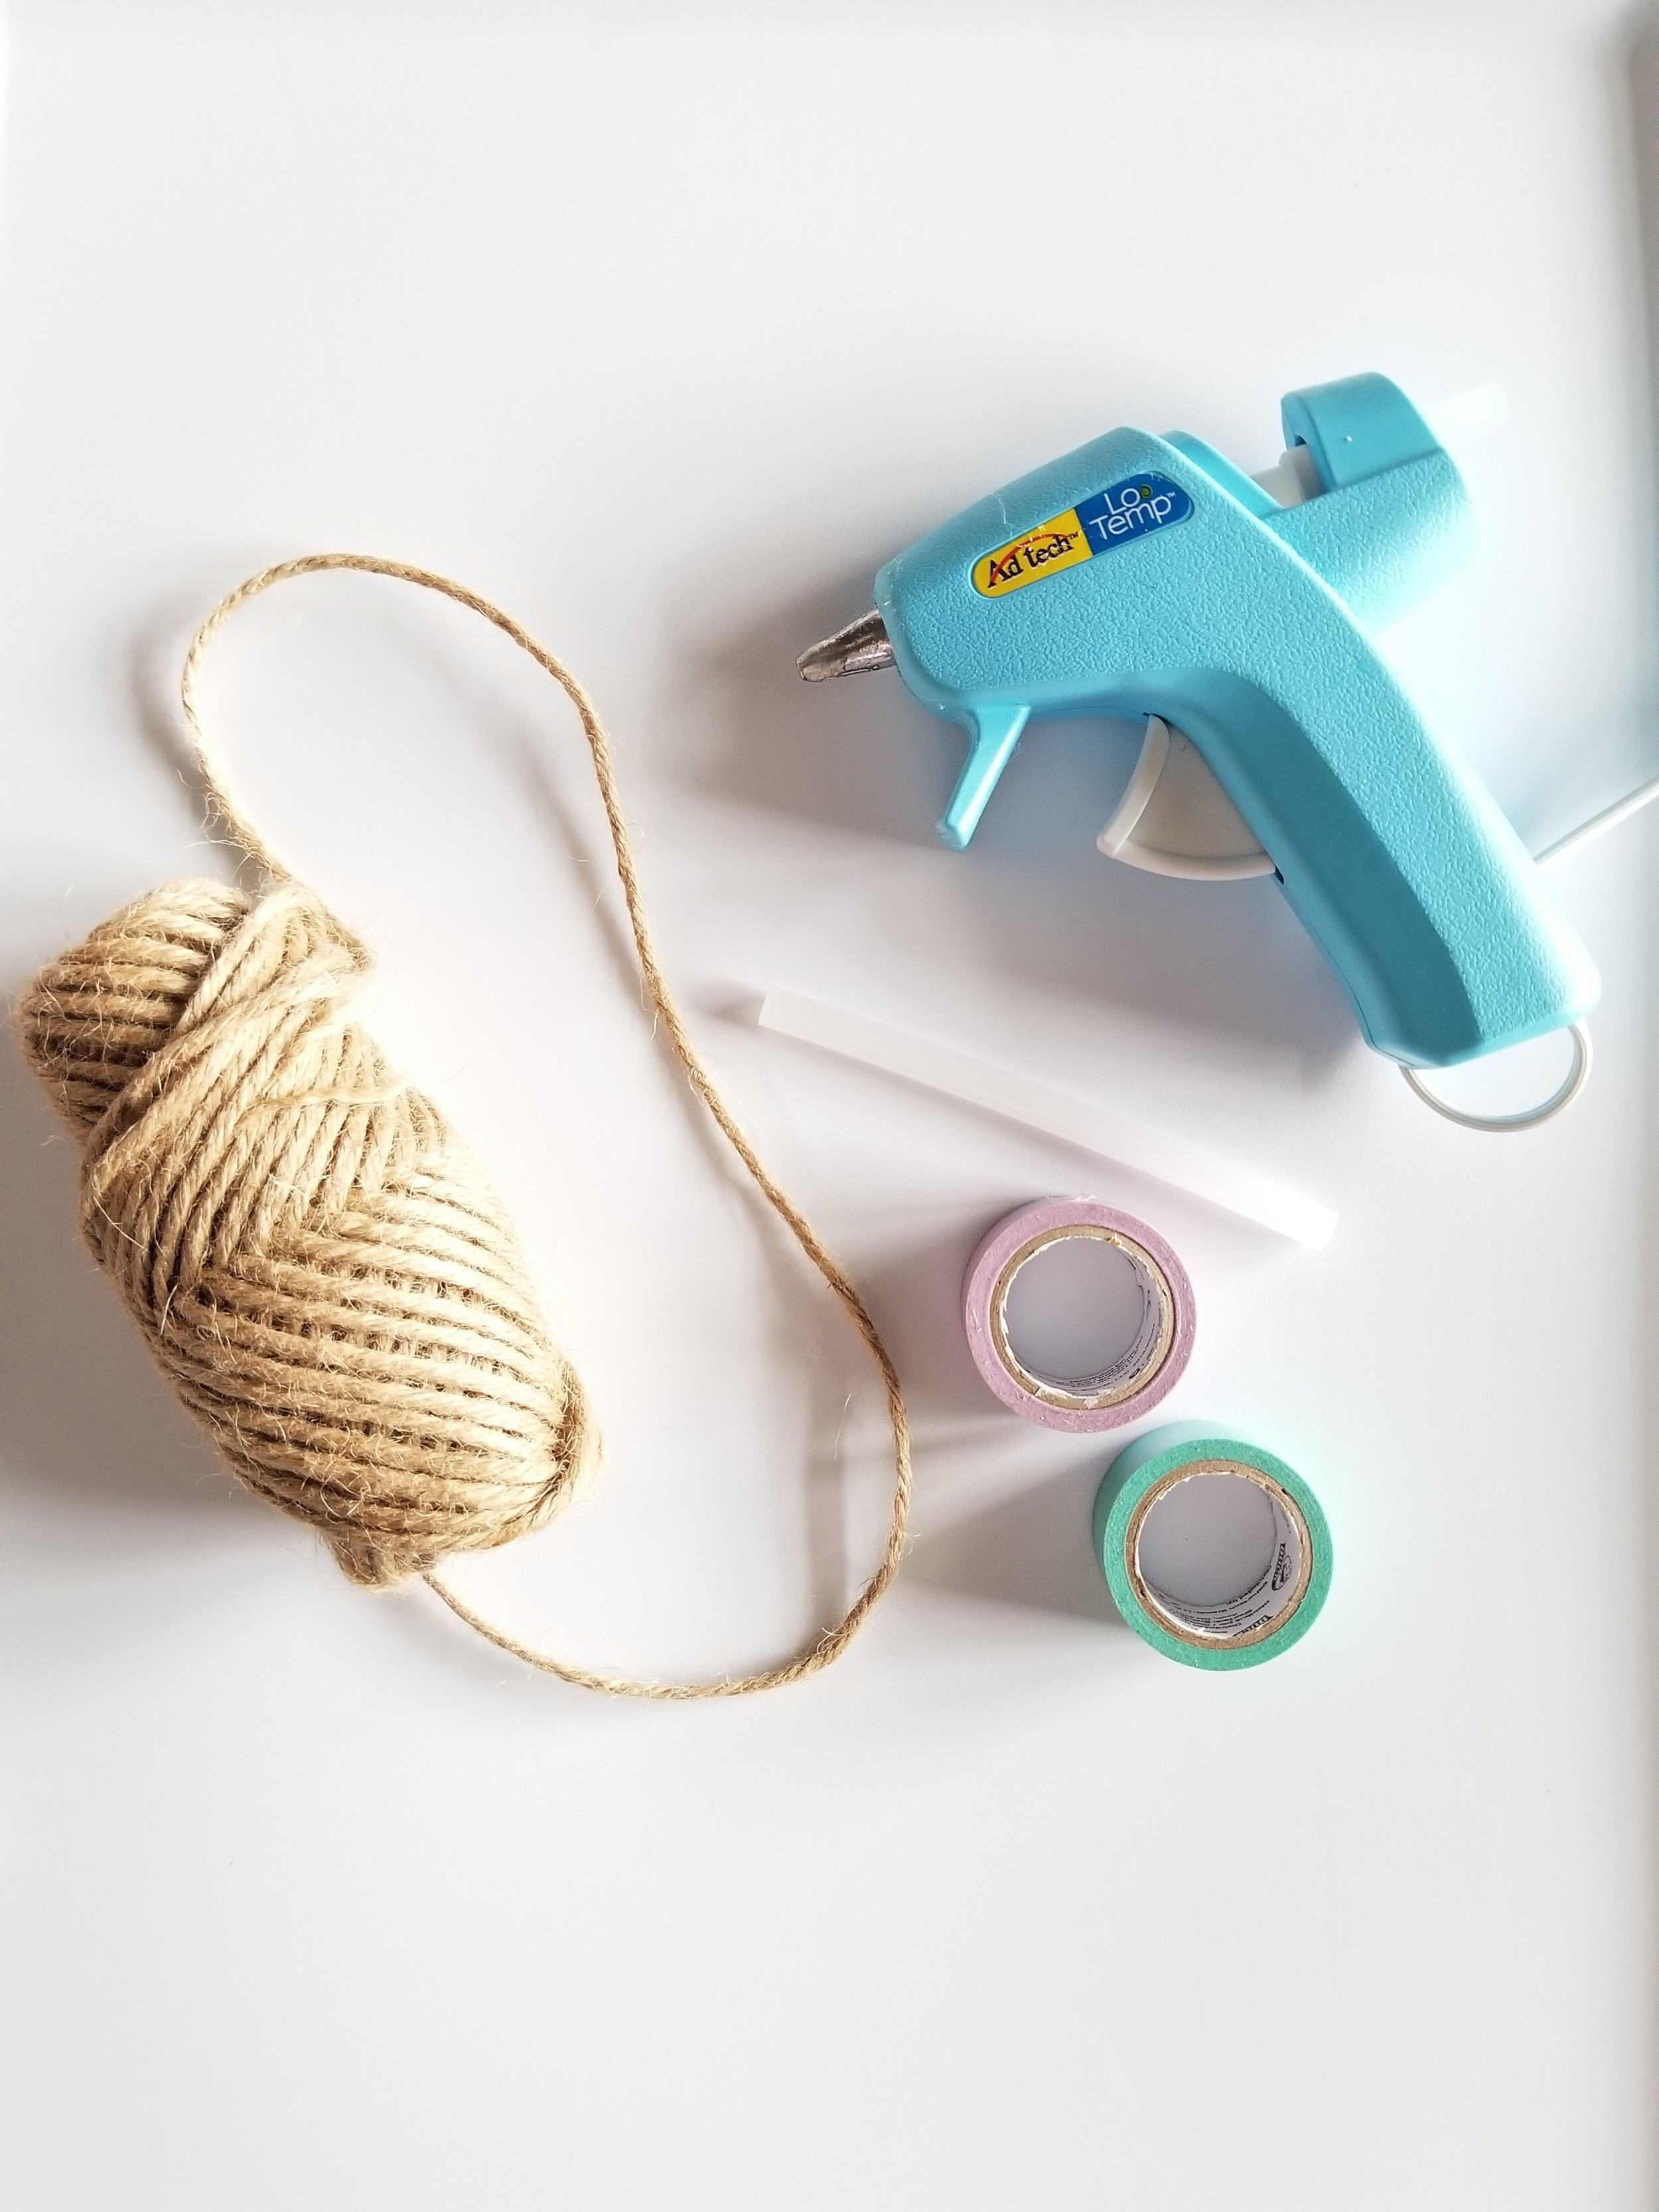 Twine, Duck Washi tape, glue gun and glue sticks.